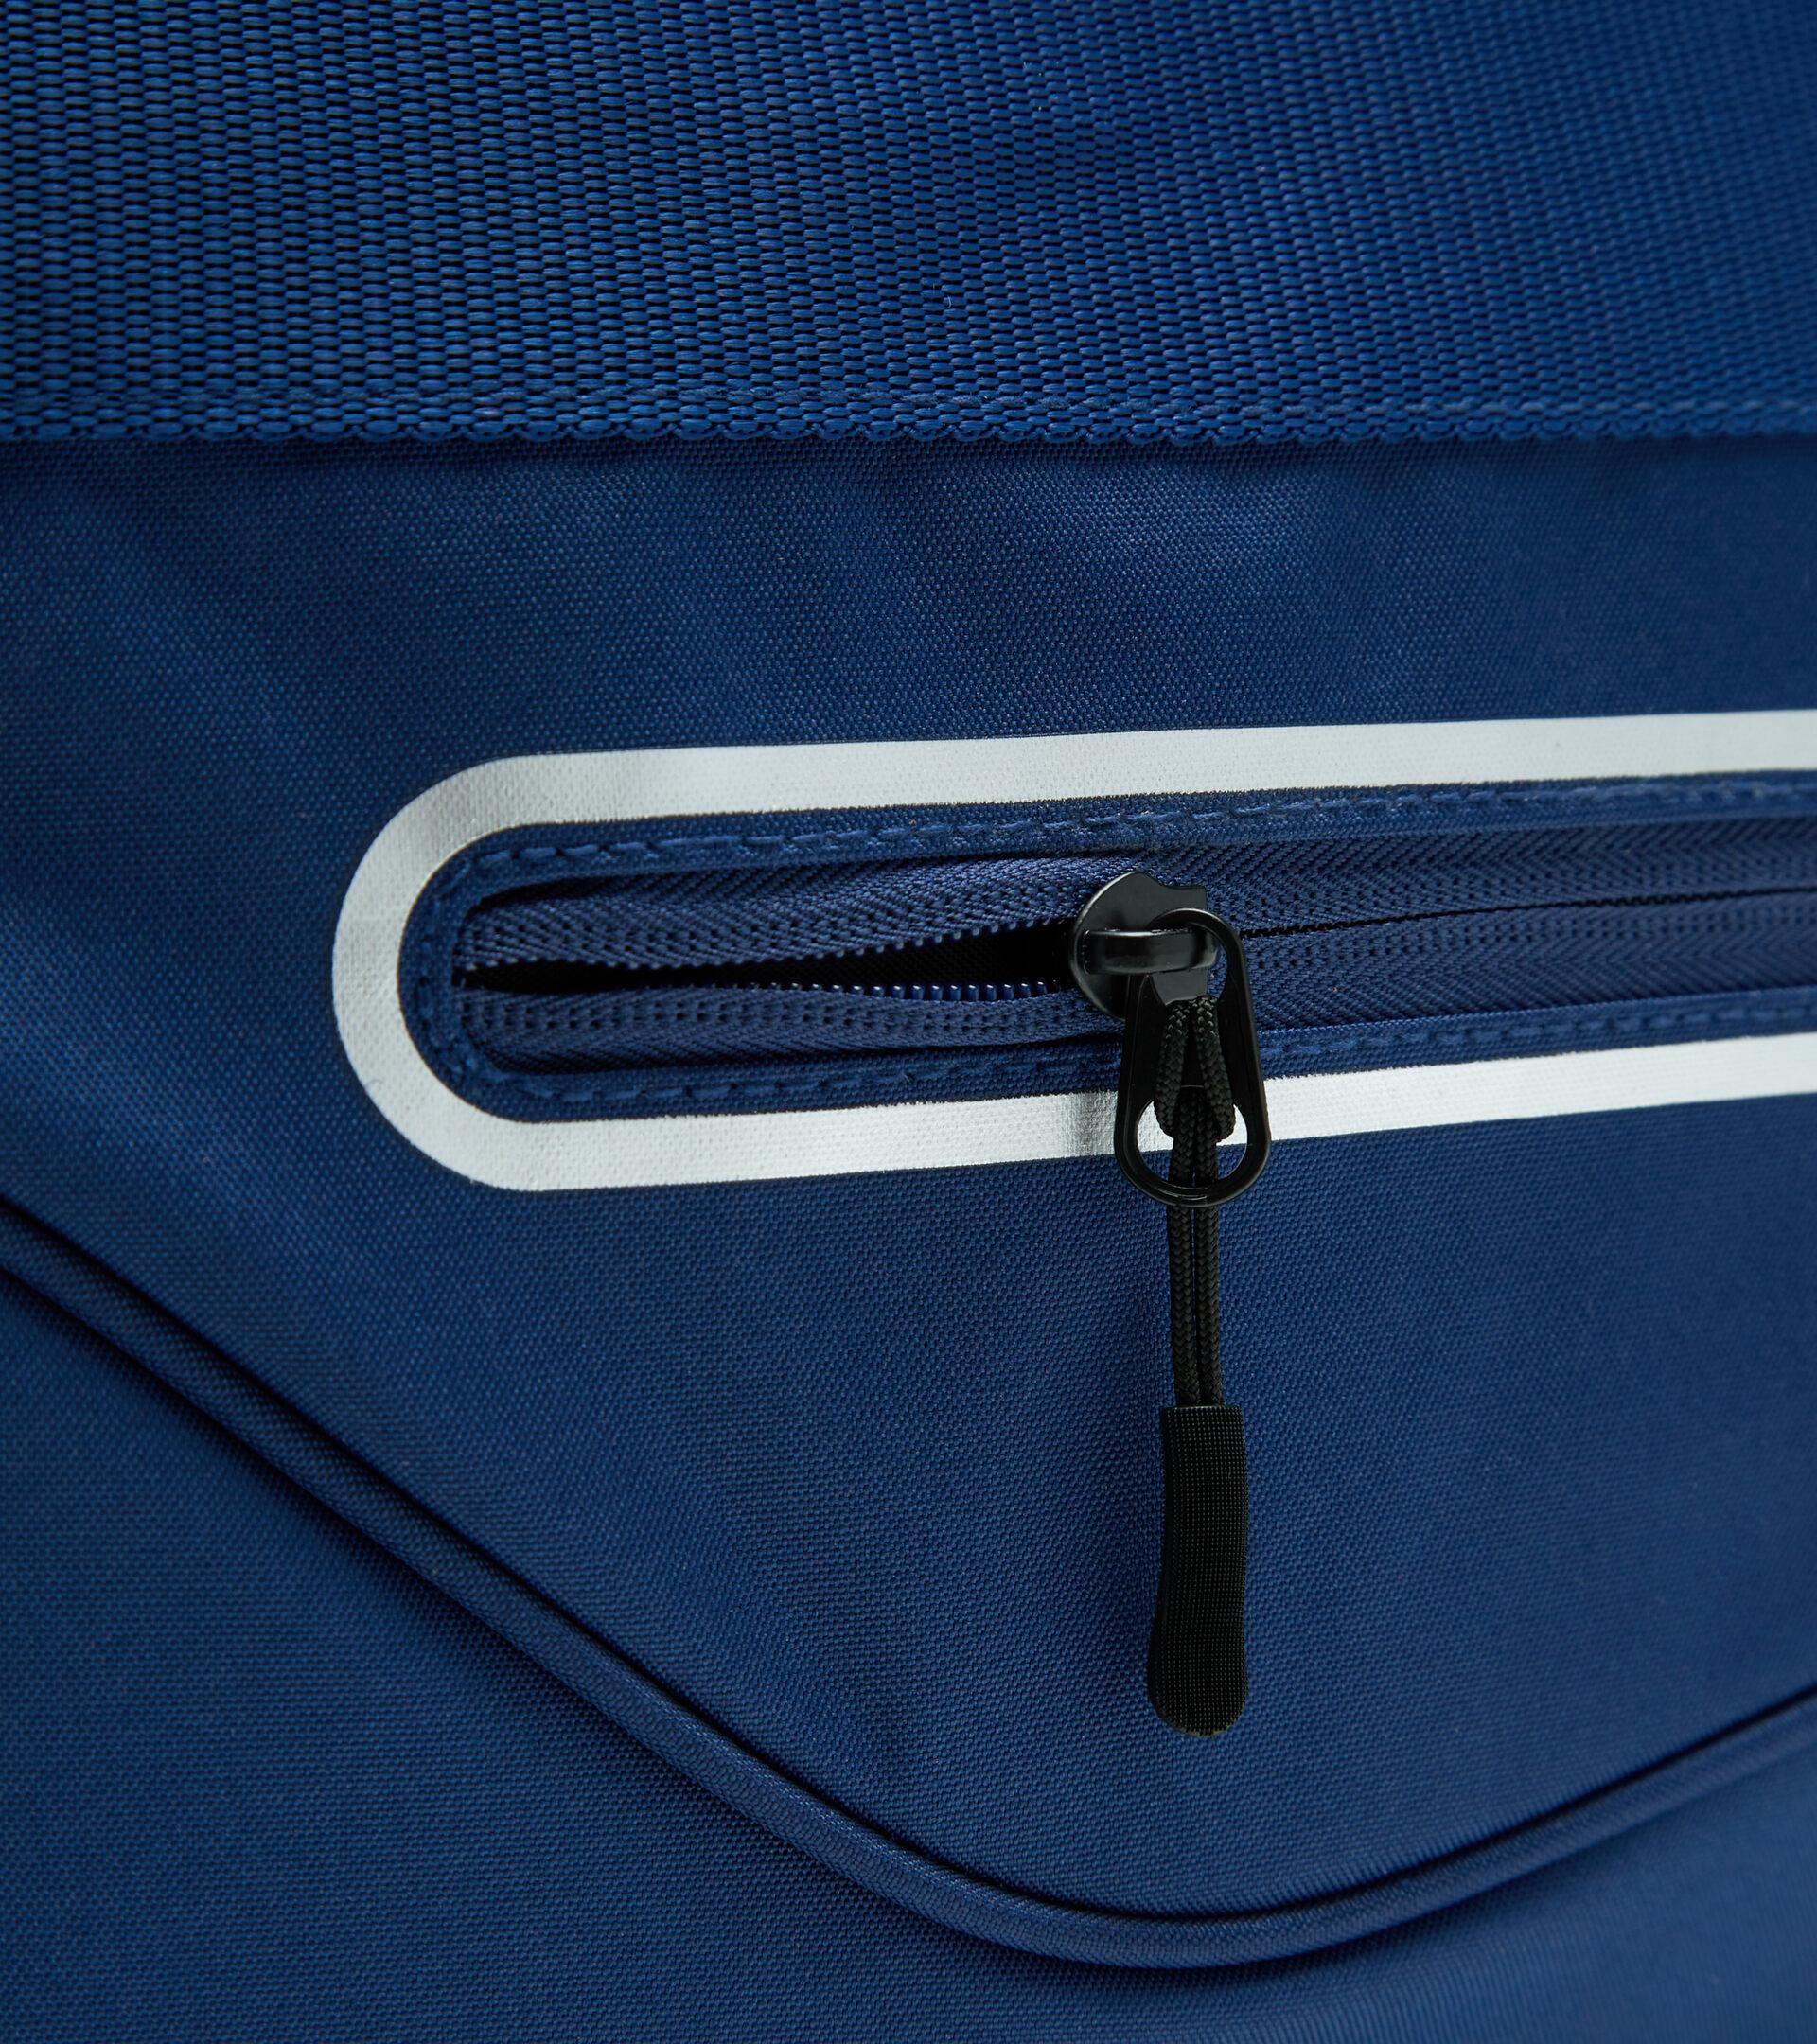 Accessories Sport UNISEX BAG TENNIS SALTIRE NAVY Diadora